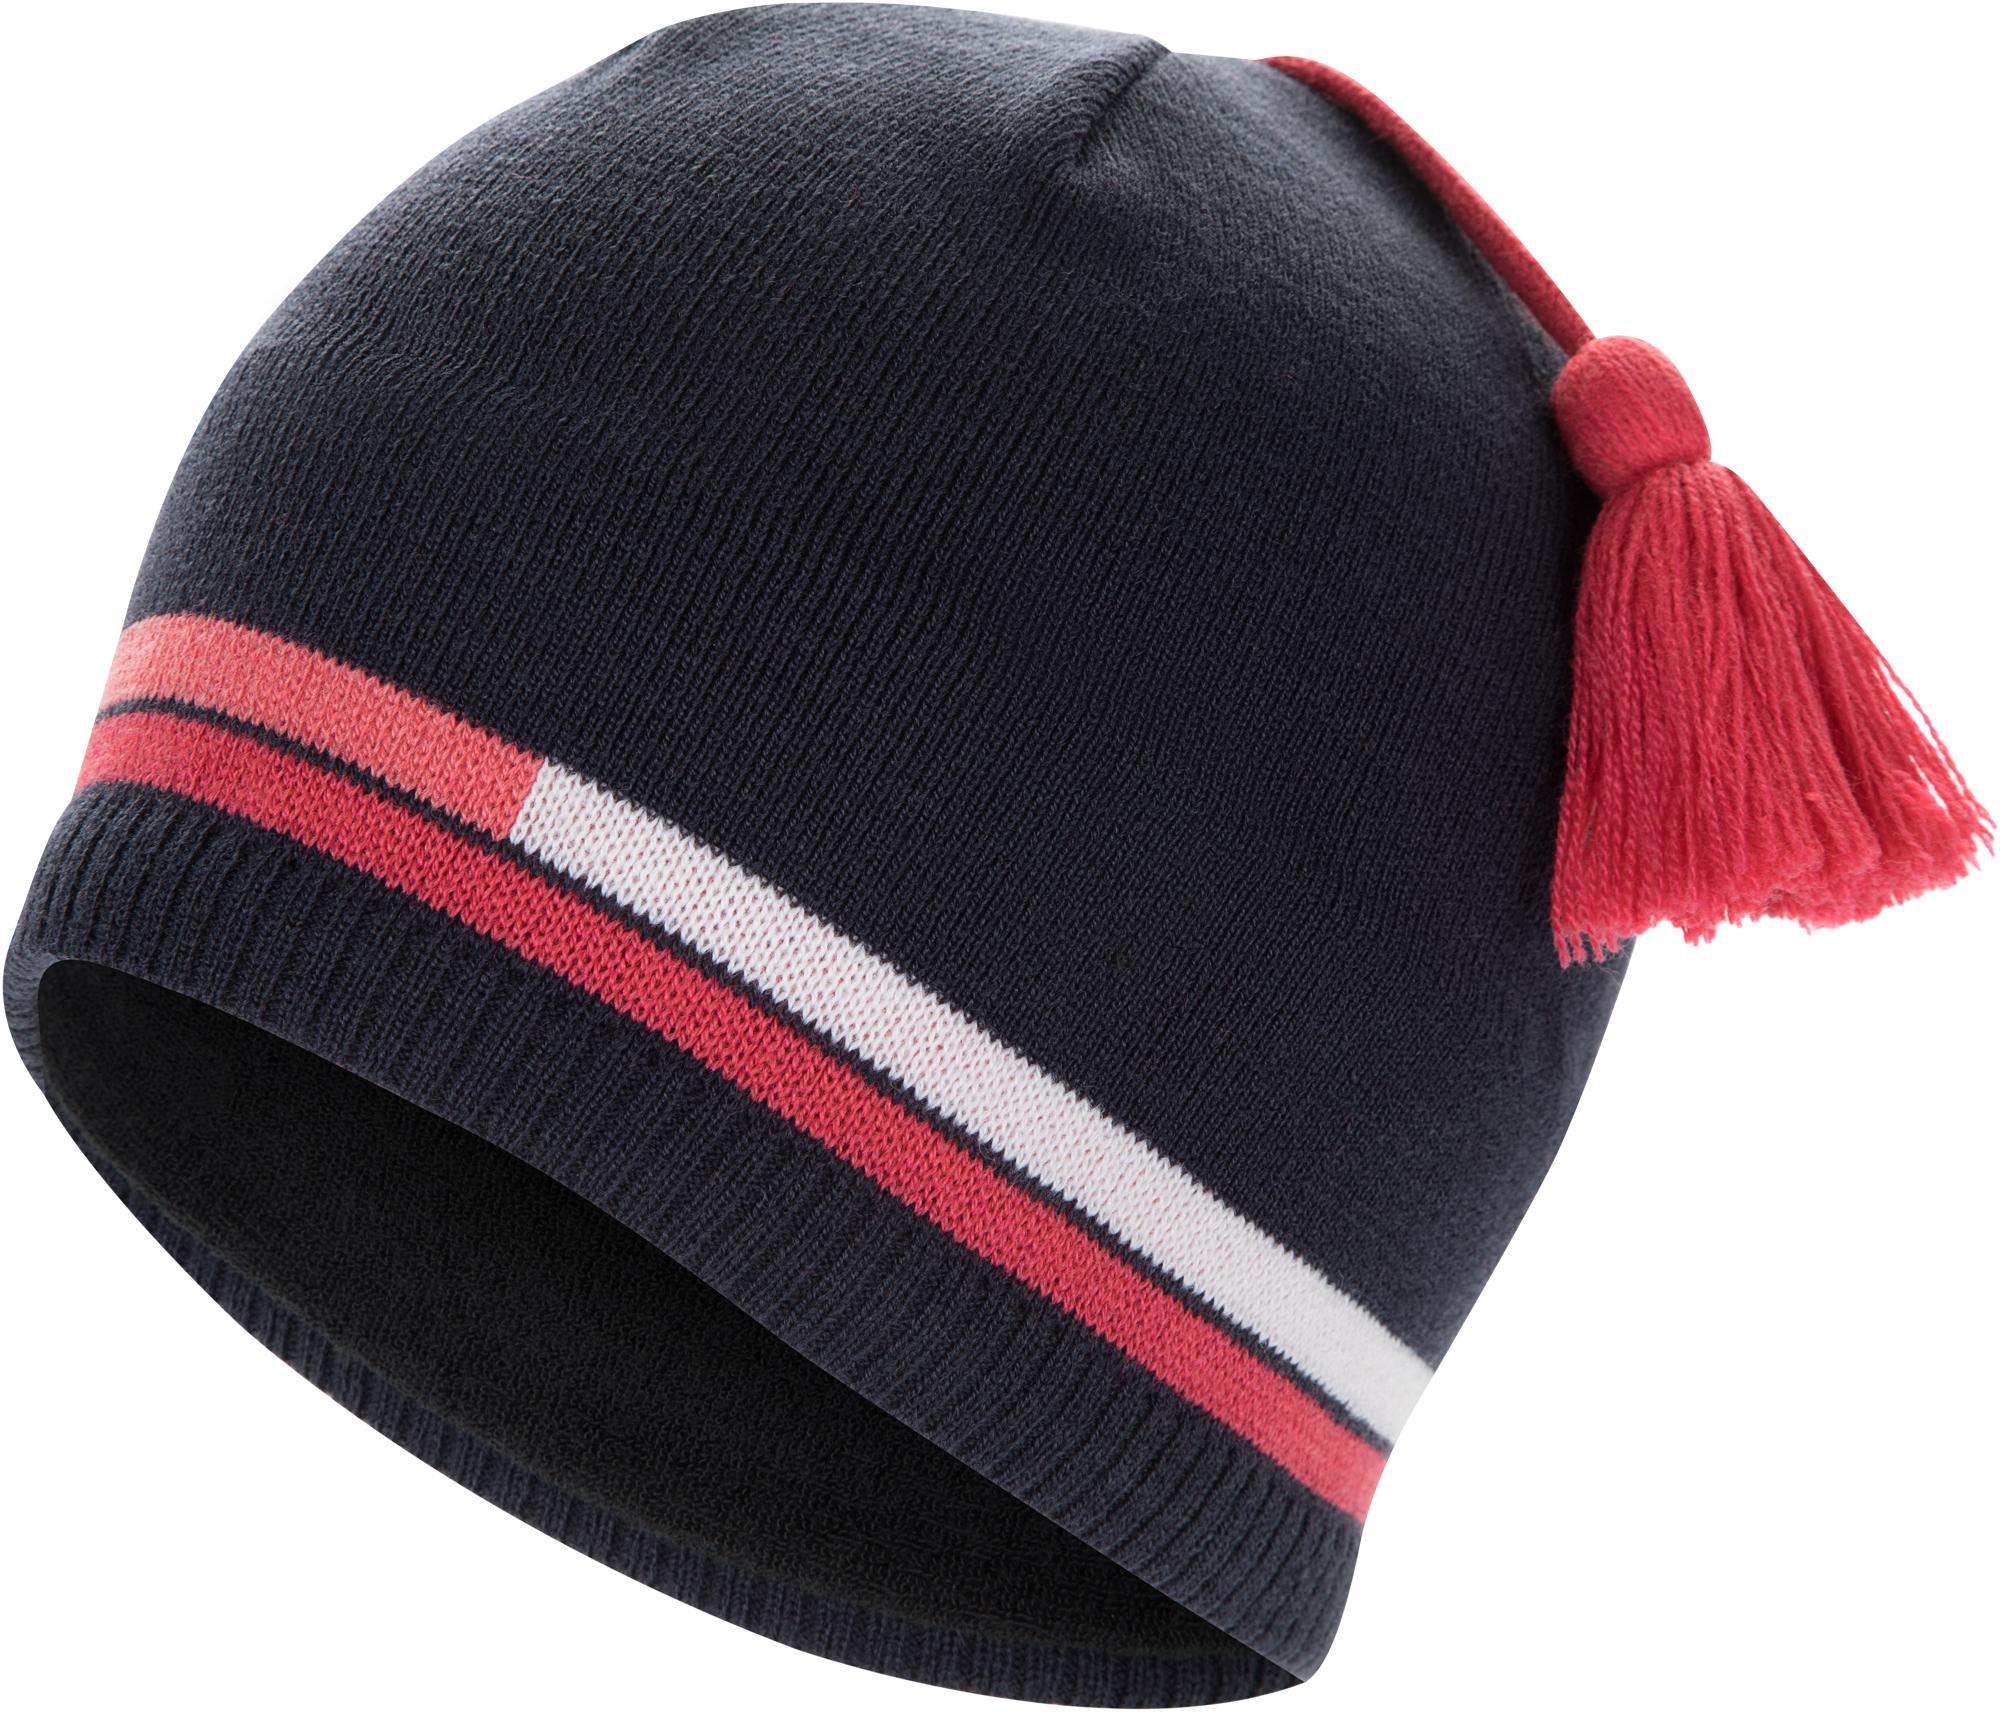 Salomon Шапка женская Salomon Escape Beanie шапка женская puma archive wm fold beanie цвет серый 02133402 размер универсальный